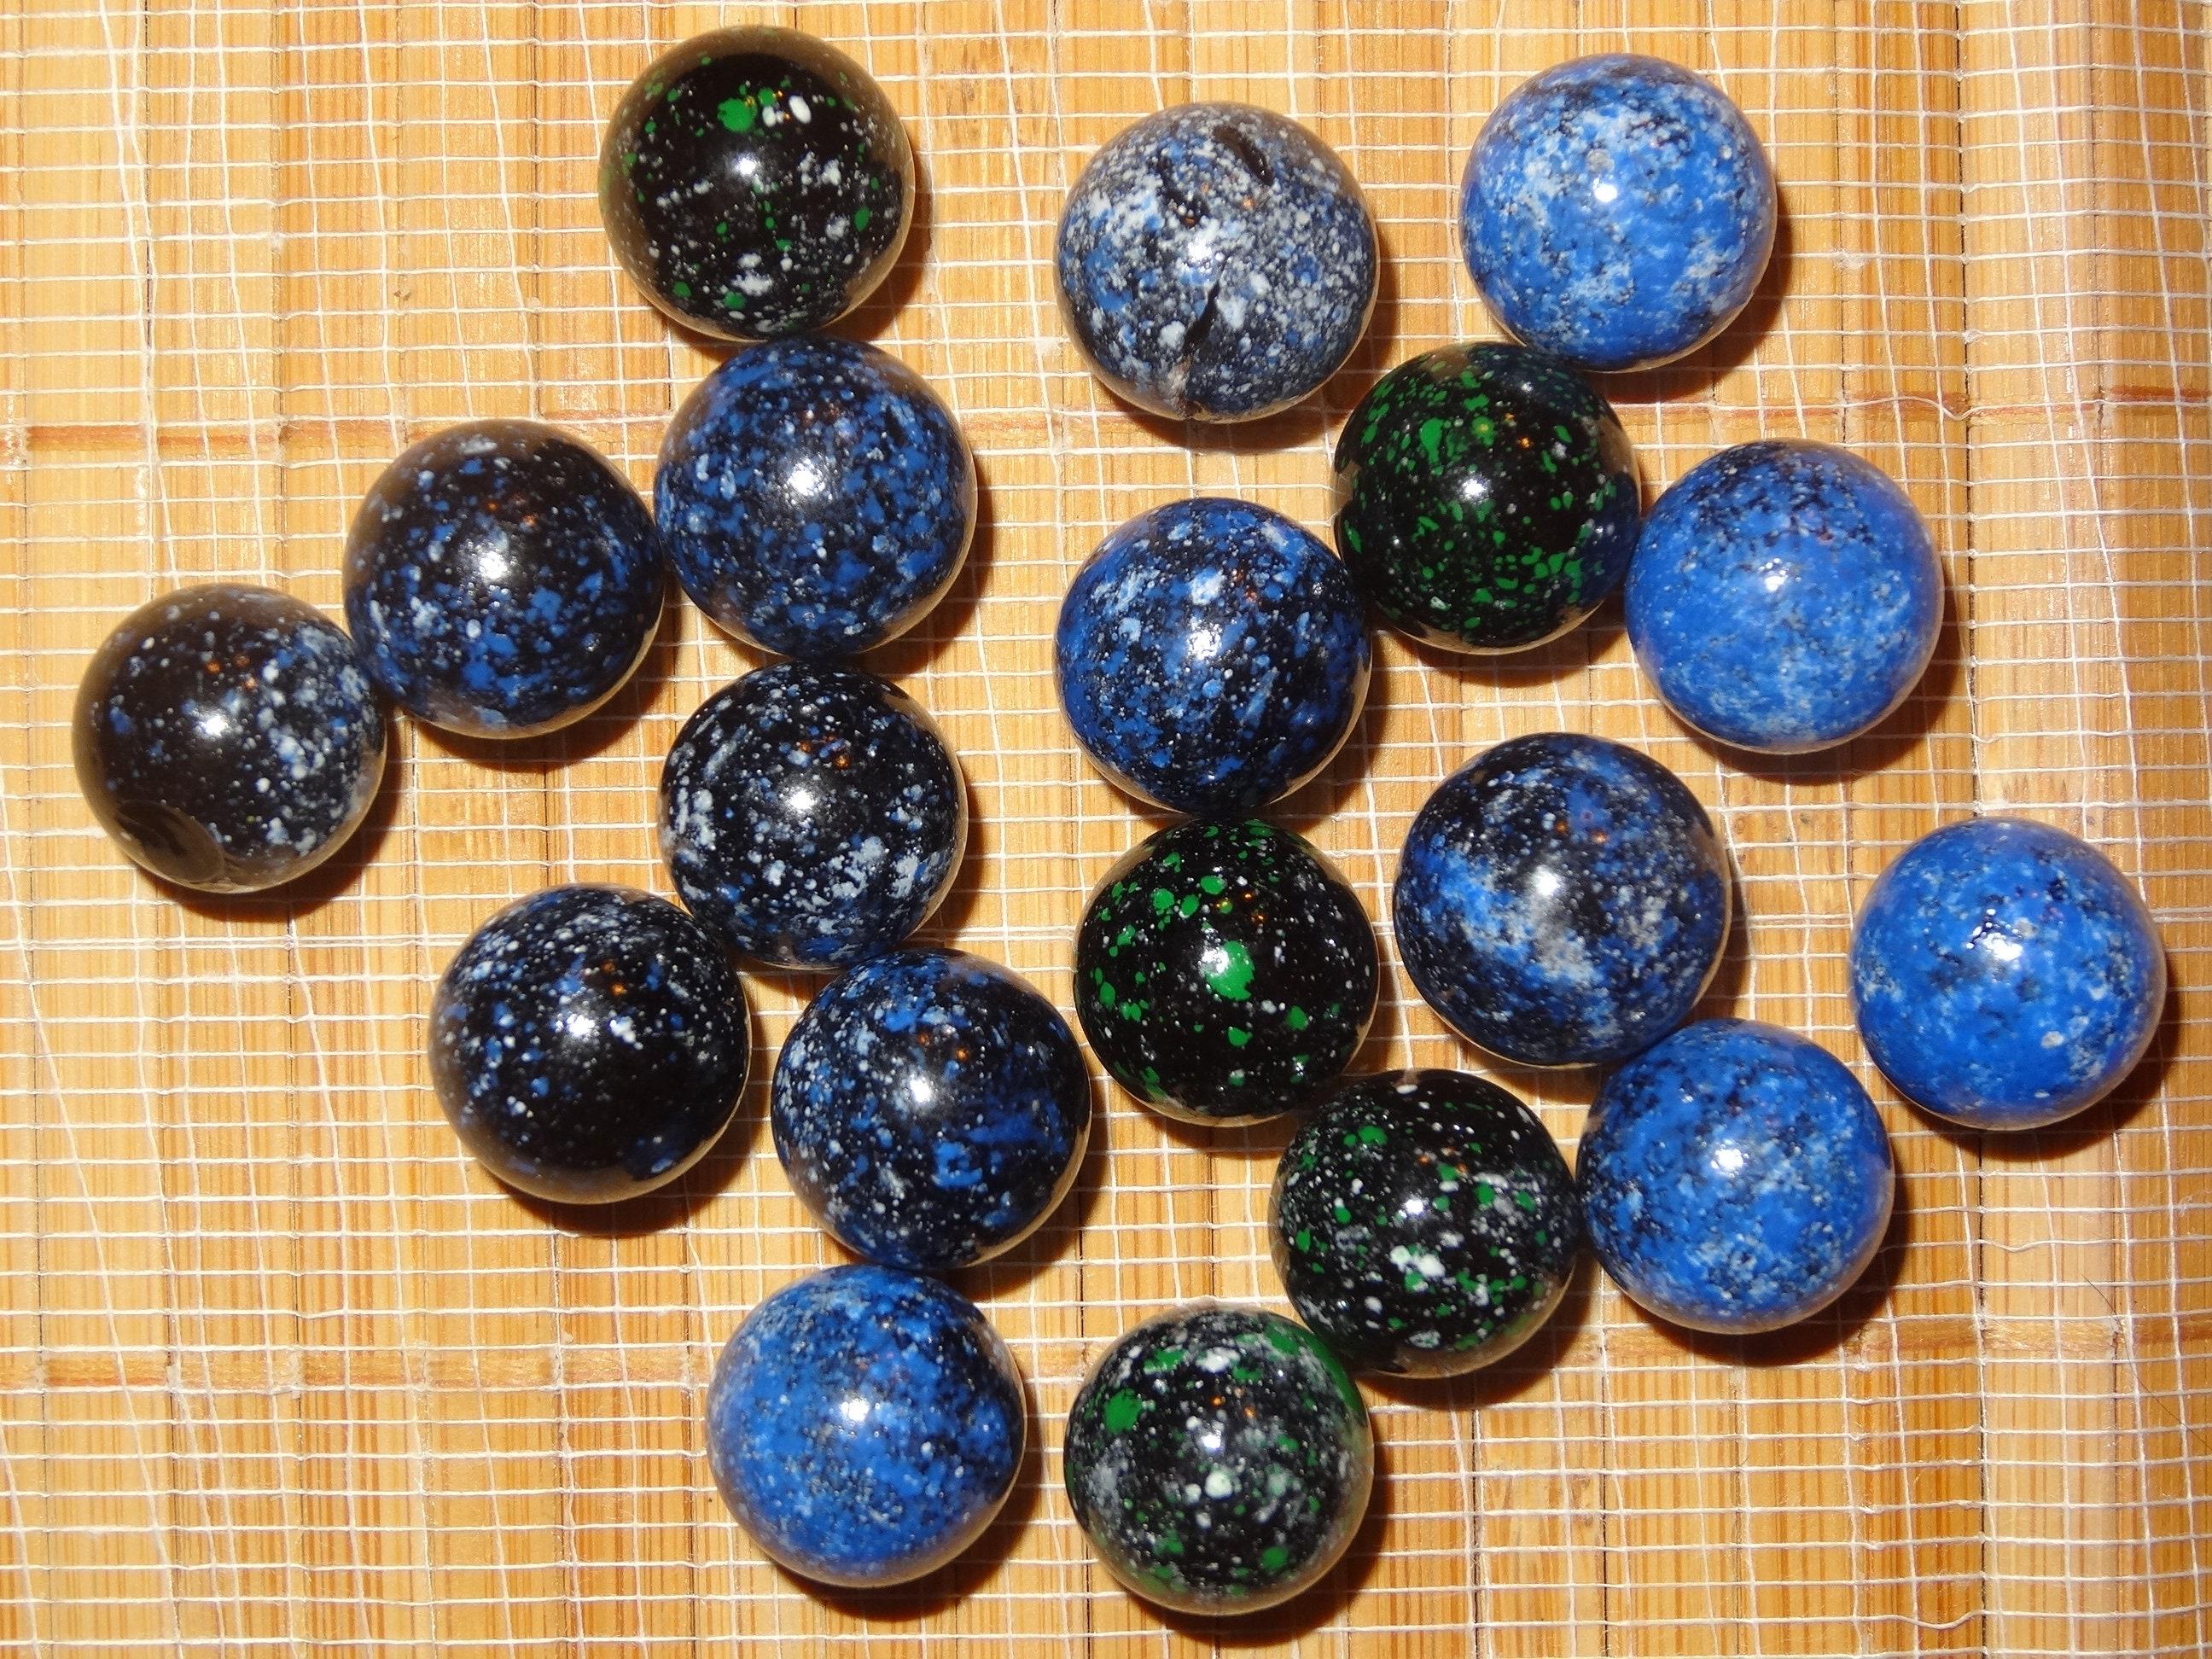 Milky Way! Vacor OFFICIAL Mega Marbles